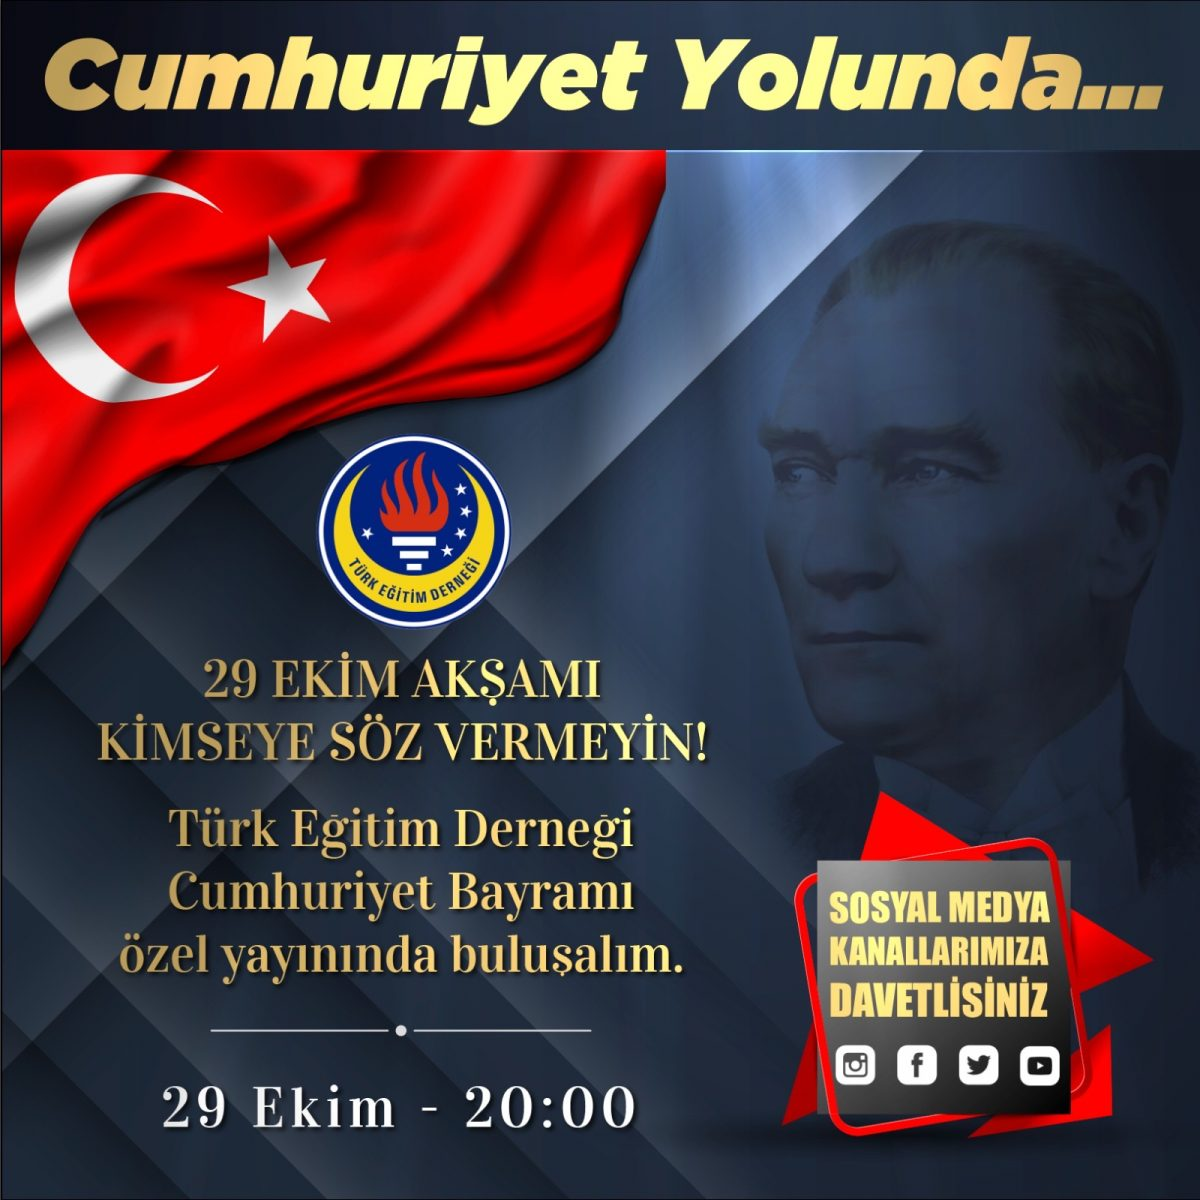 Cumhuriyet Yolunda